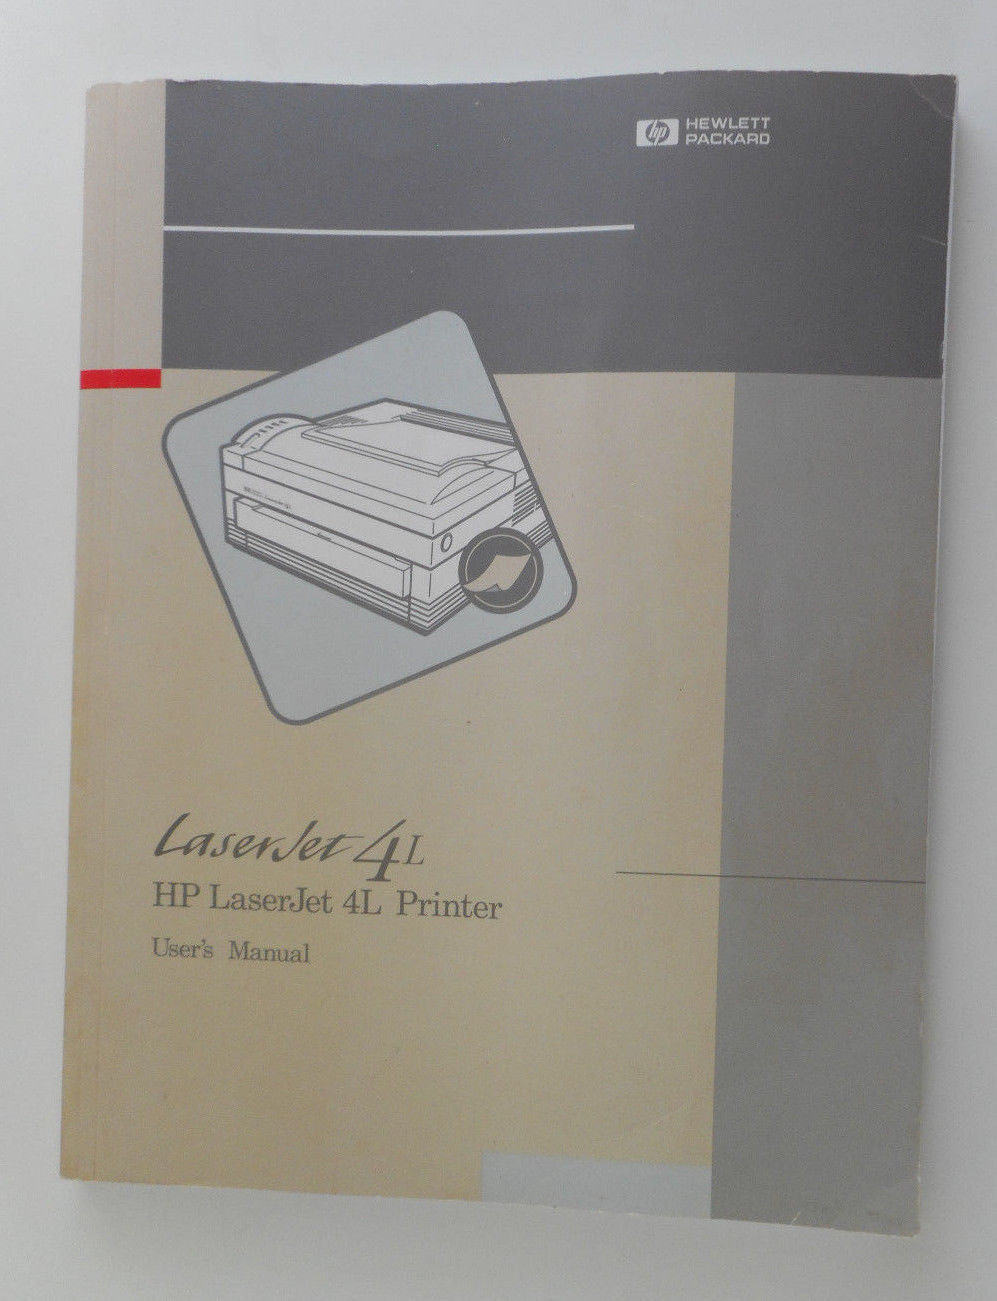 User's Manual HP LaserJet 4L Printer Hewlett Packard good used condition